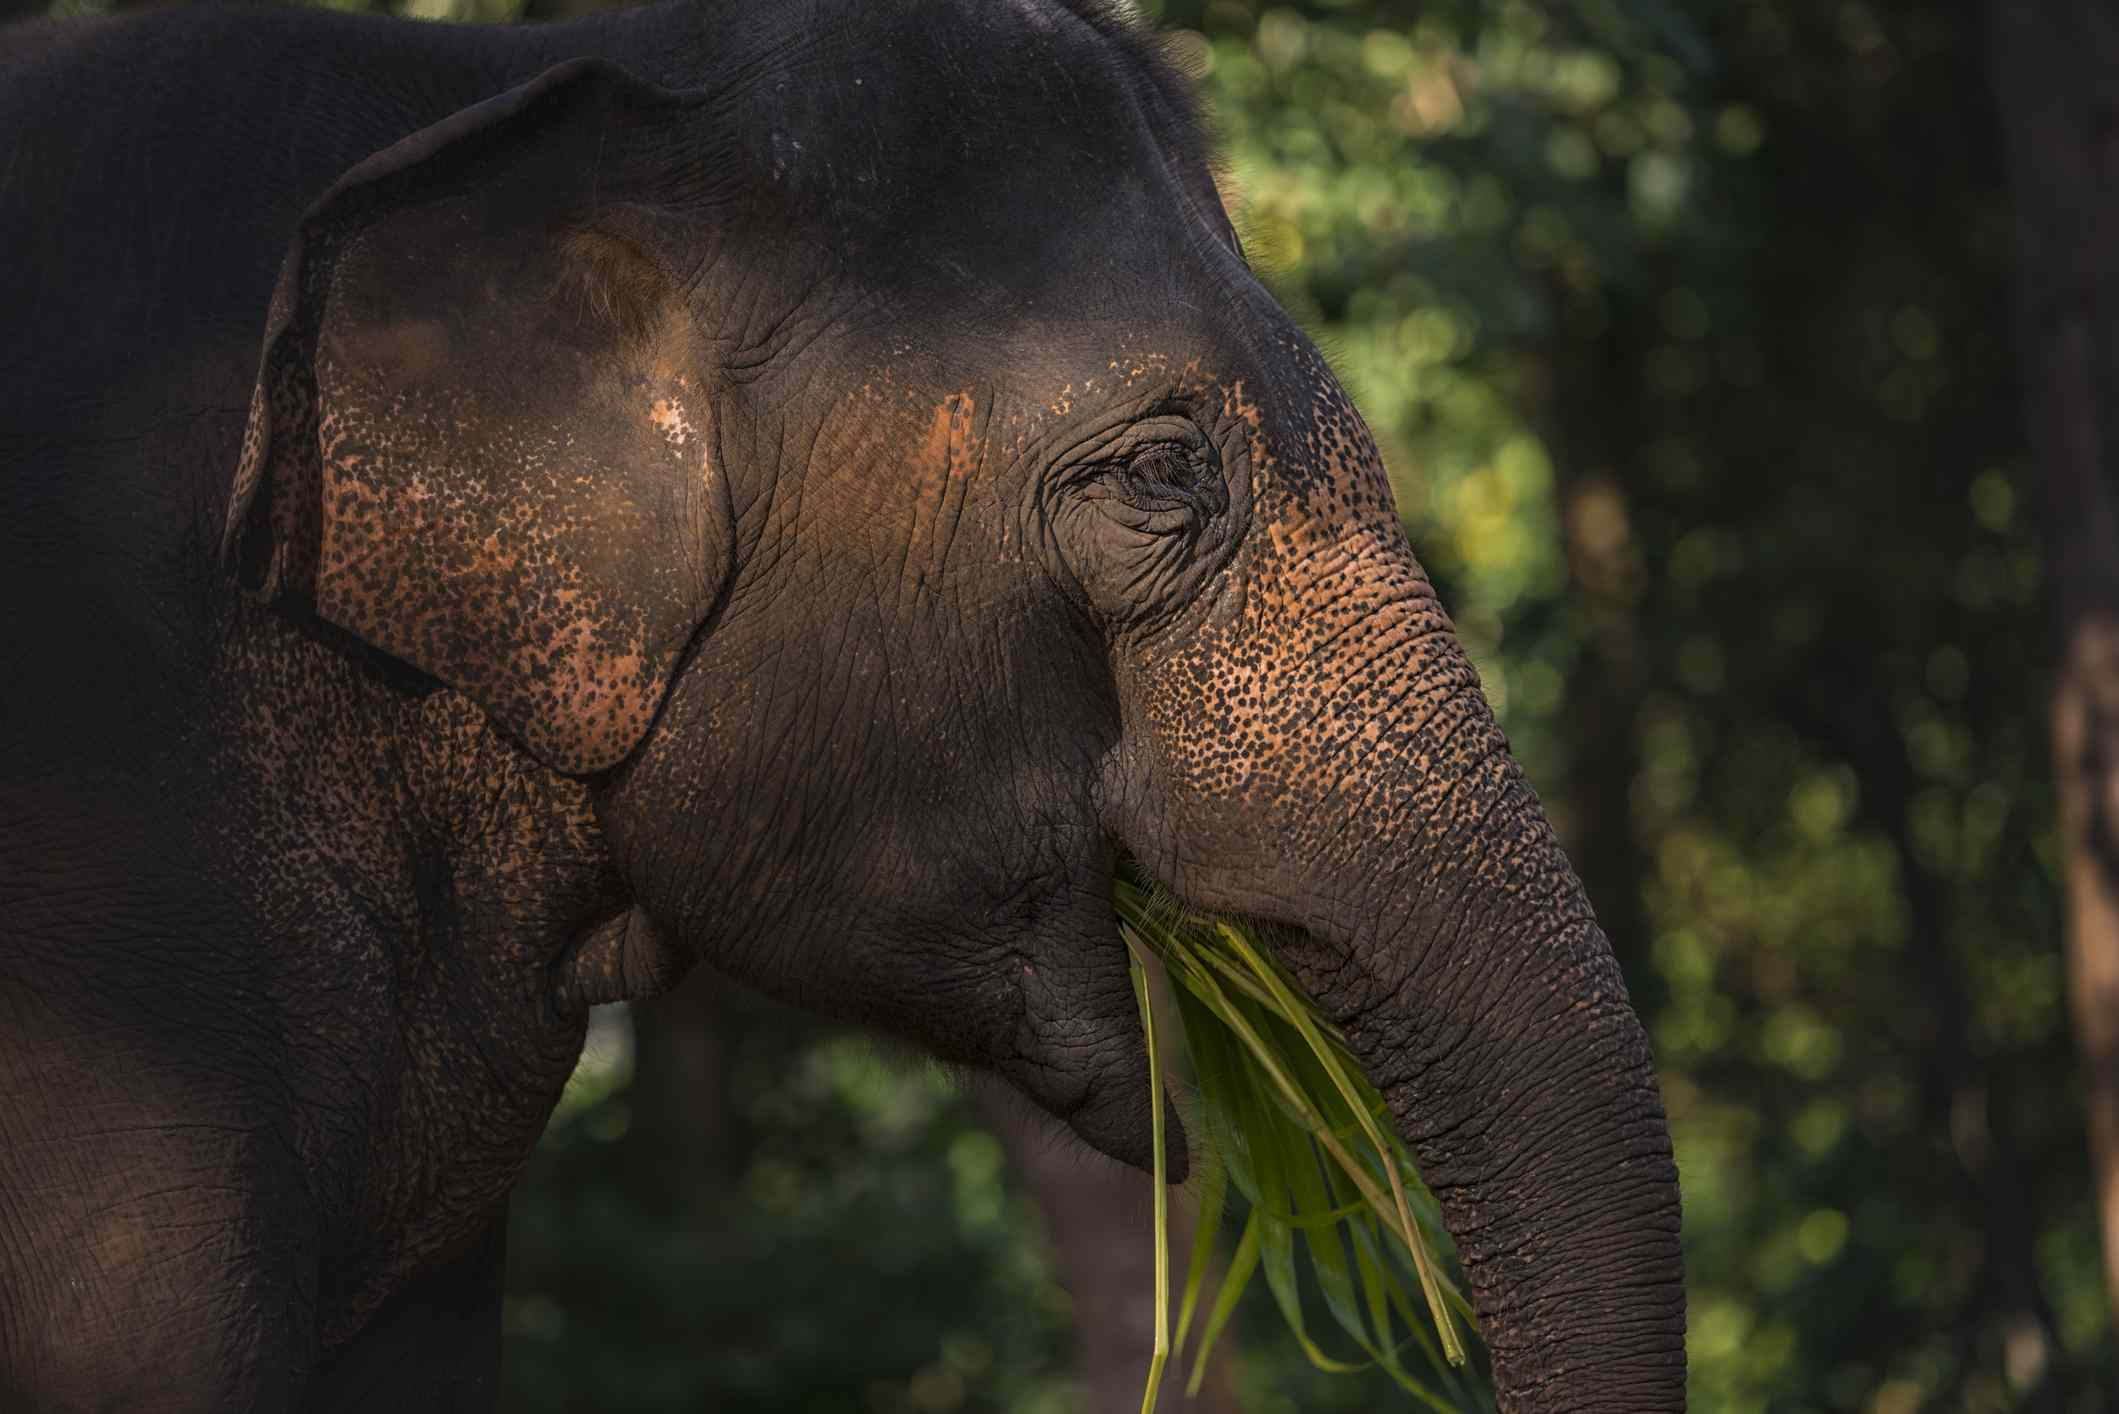 An Asian elephant in Chaing Man,Thailand